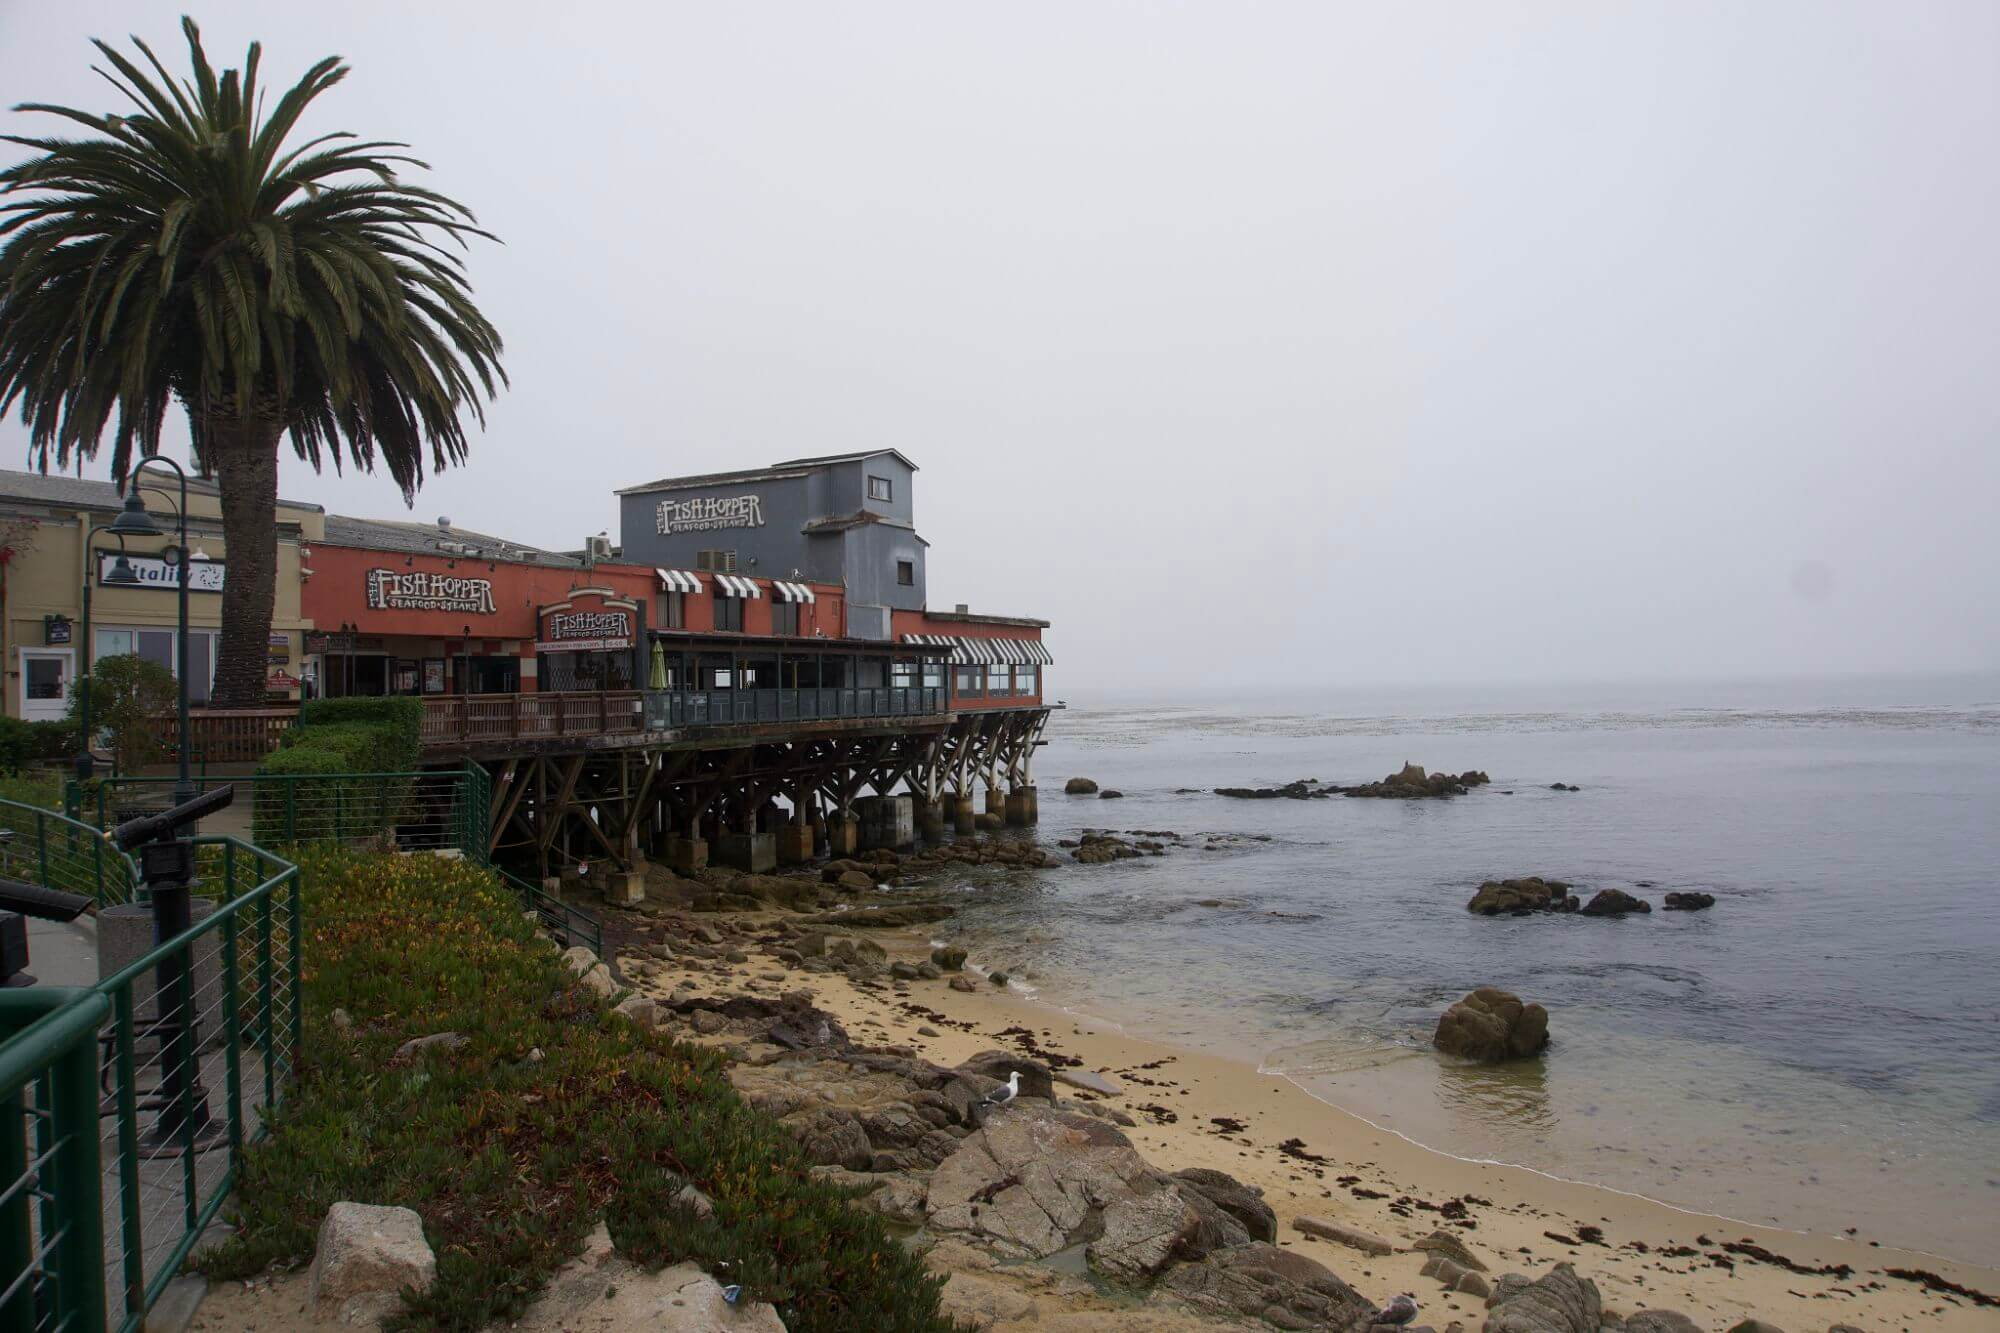 Fish Hopper Restaurant in Monterey